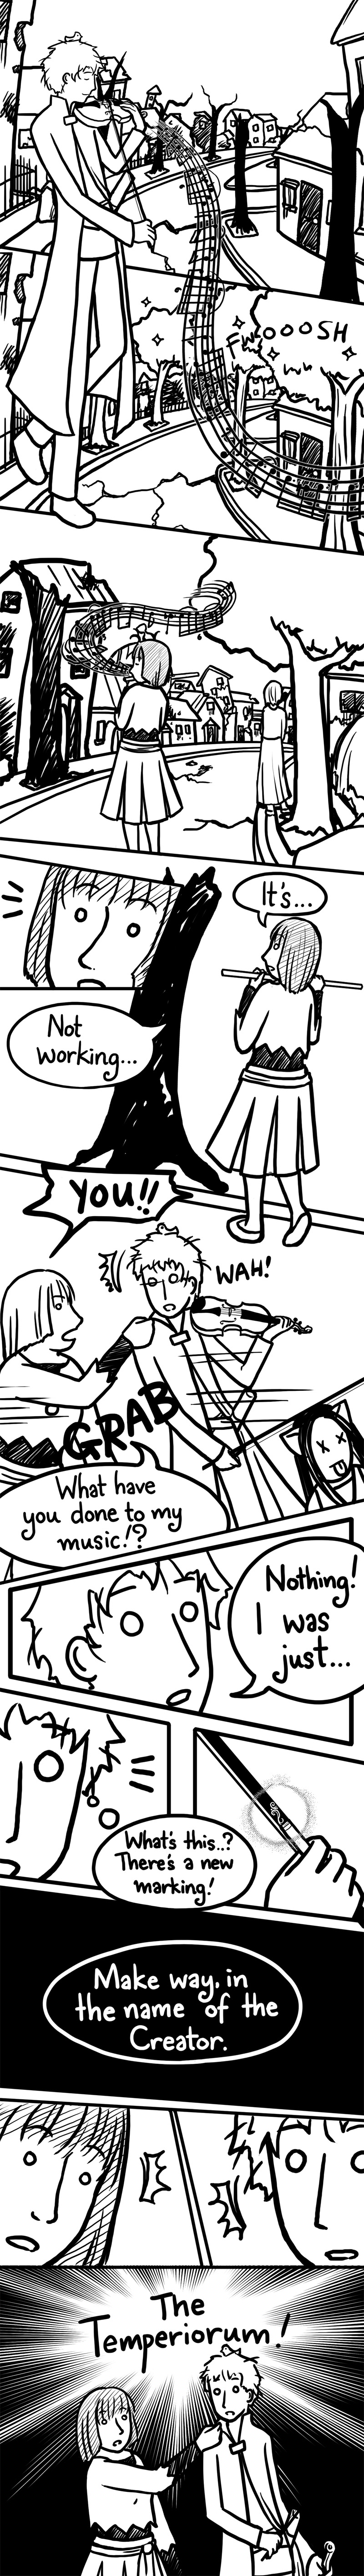 Kieran's smug little violin-playing look... :)